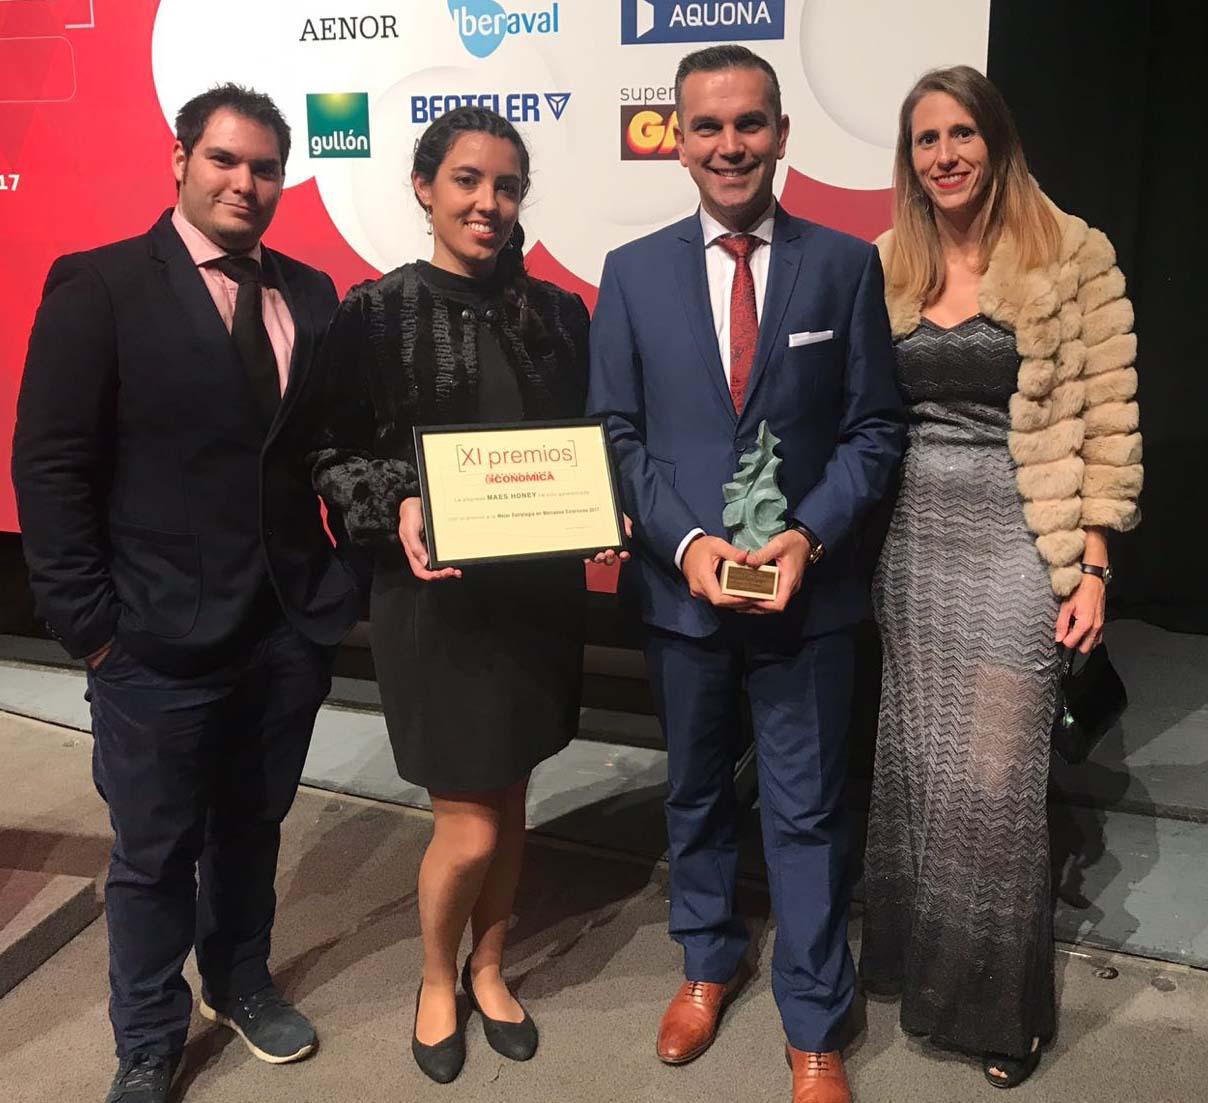 Maes-Honey-premio-CYL-economica